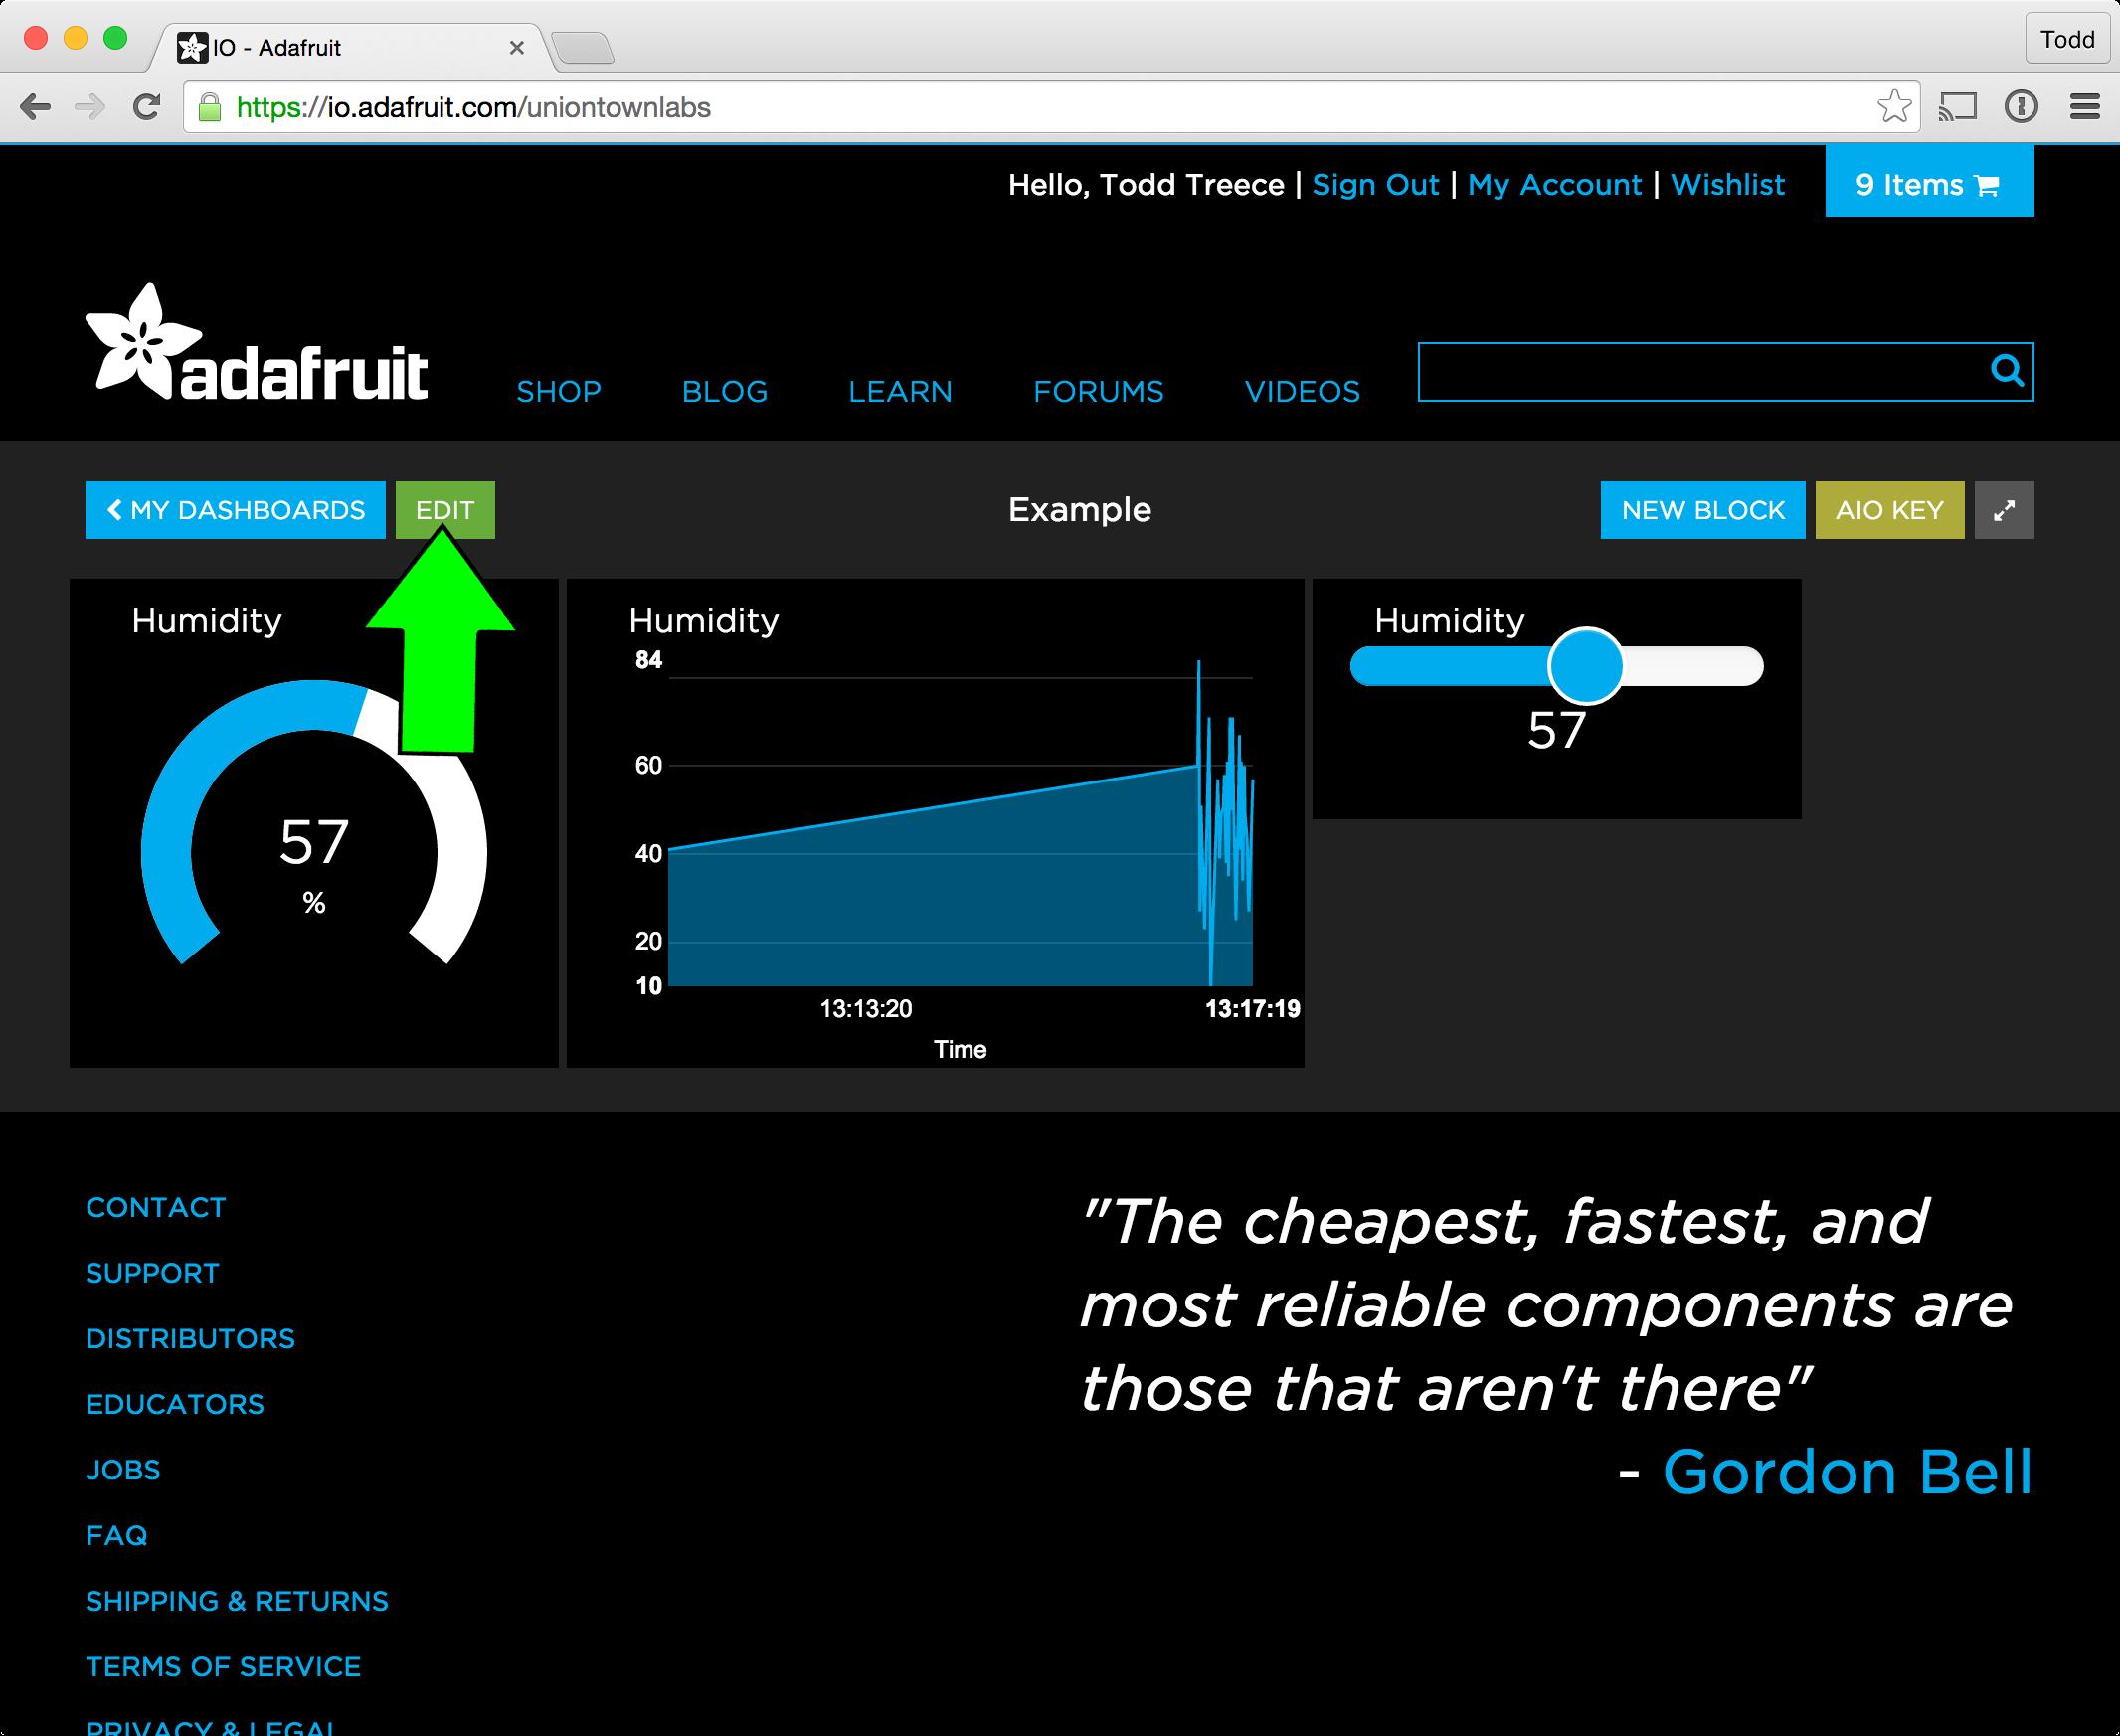 adafruit_io_edit_dashboard.png